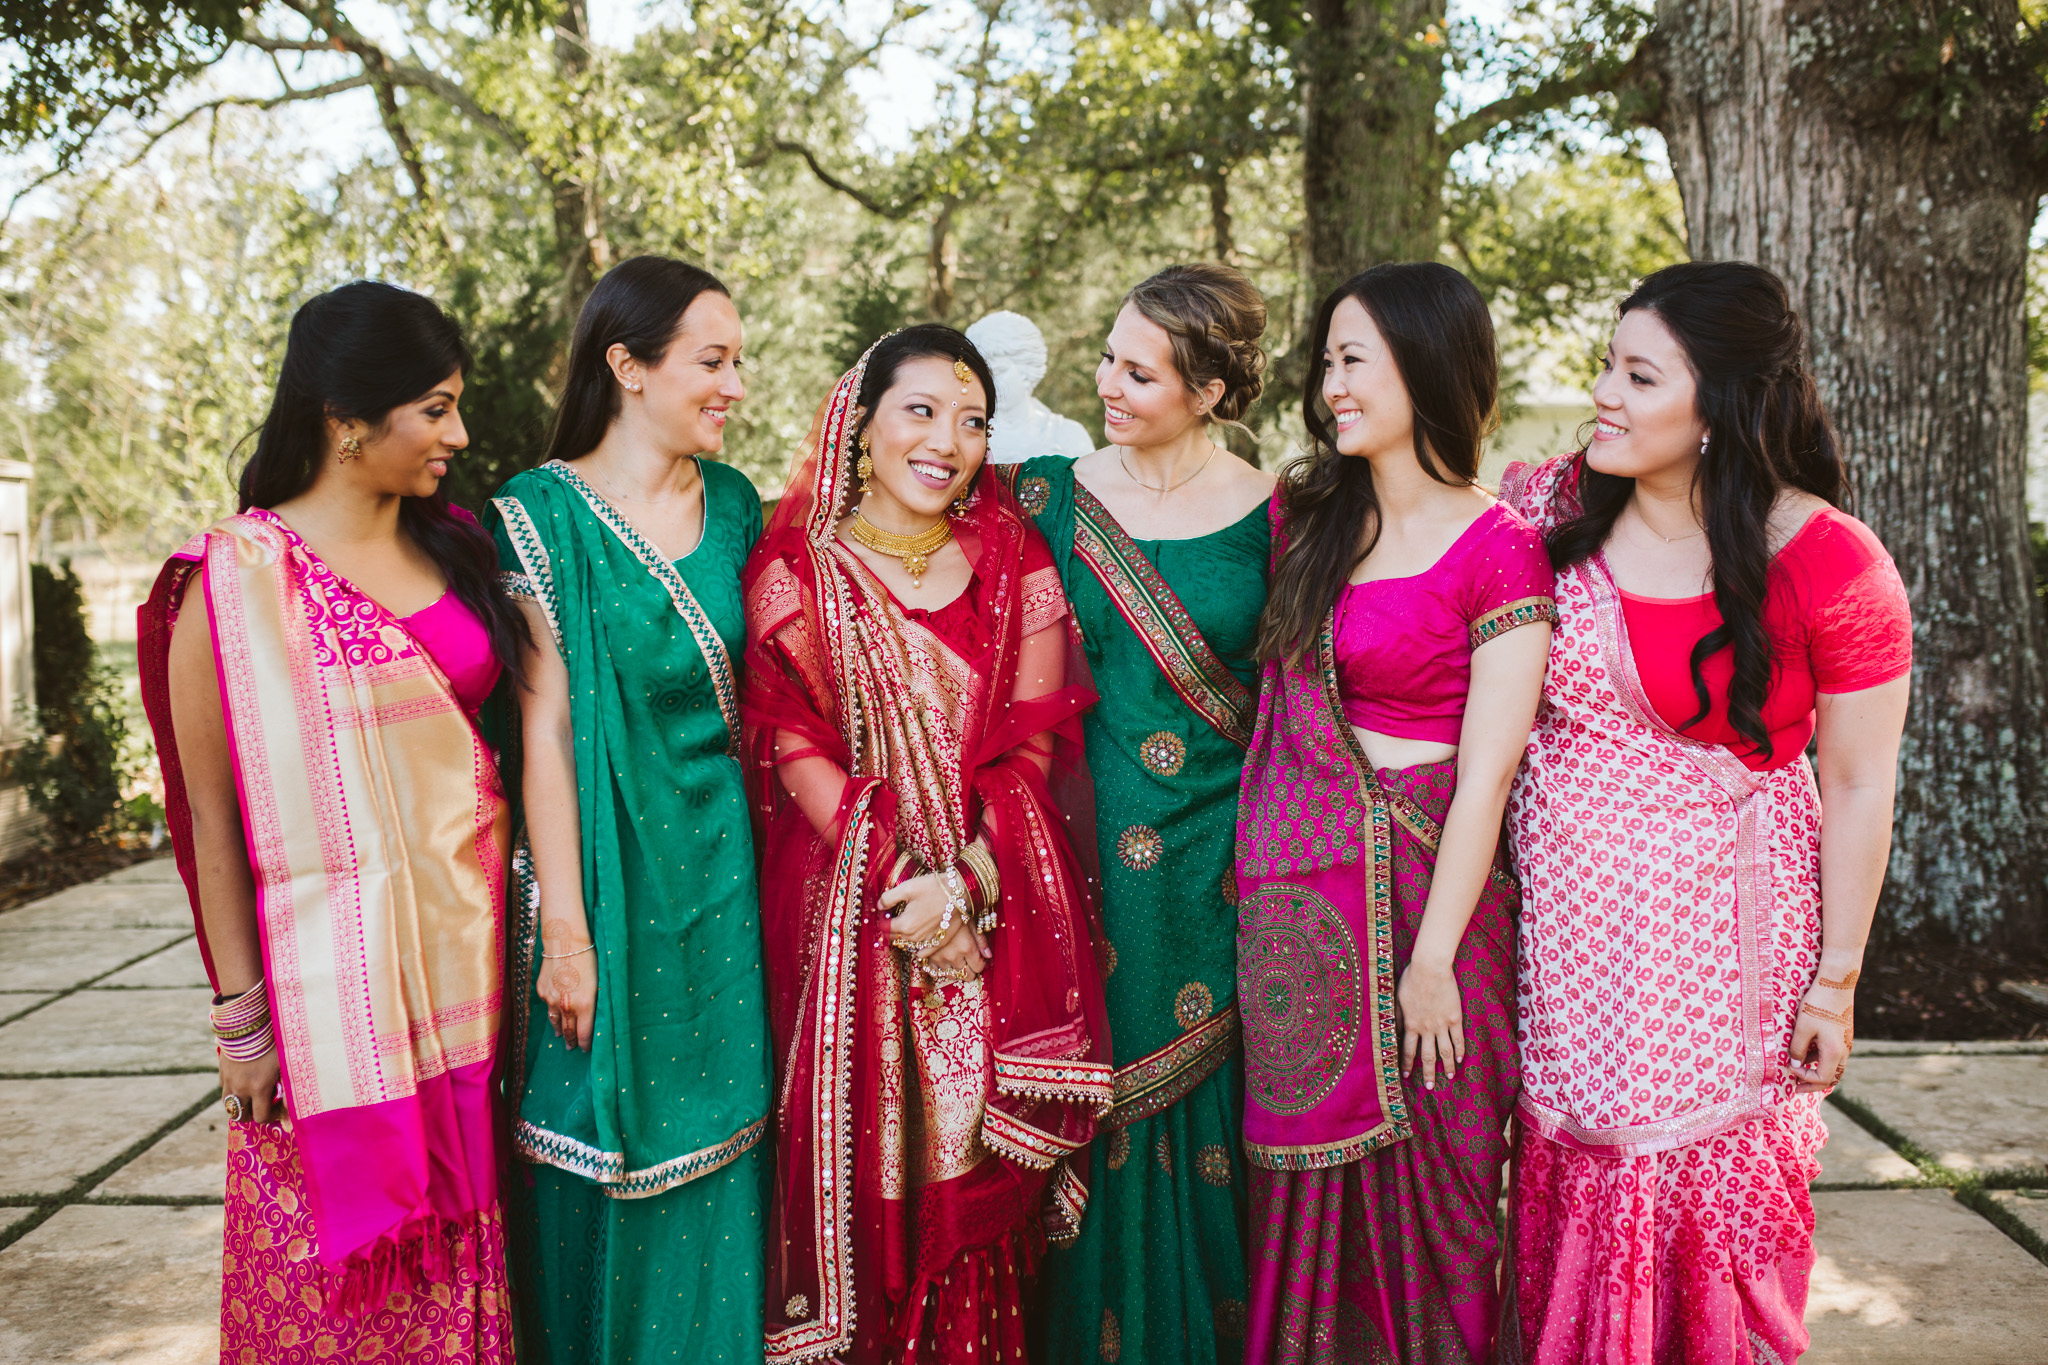 rebeccaburtphotography.hindiwedding.moraisvineyards.virginiawedding-40.JPG